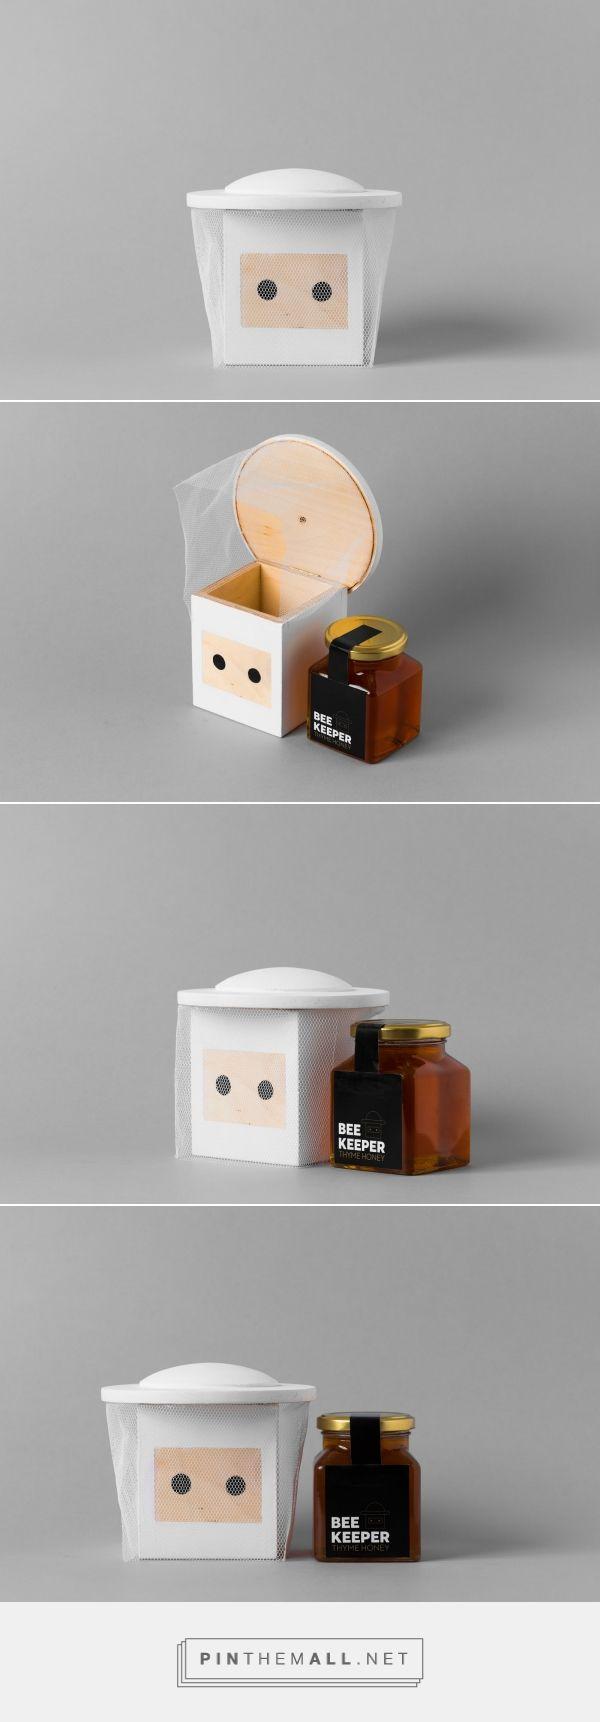 Beekeeper honey packaging by Busy Bee - http://www.packagingoftheworld.com/2017/09/beekeeper.html